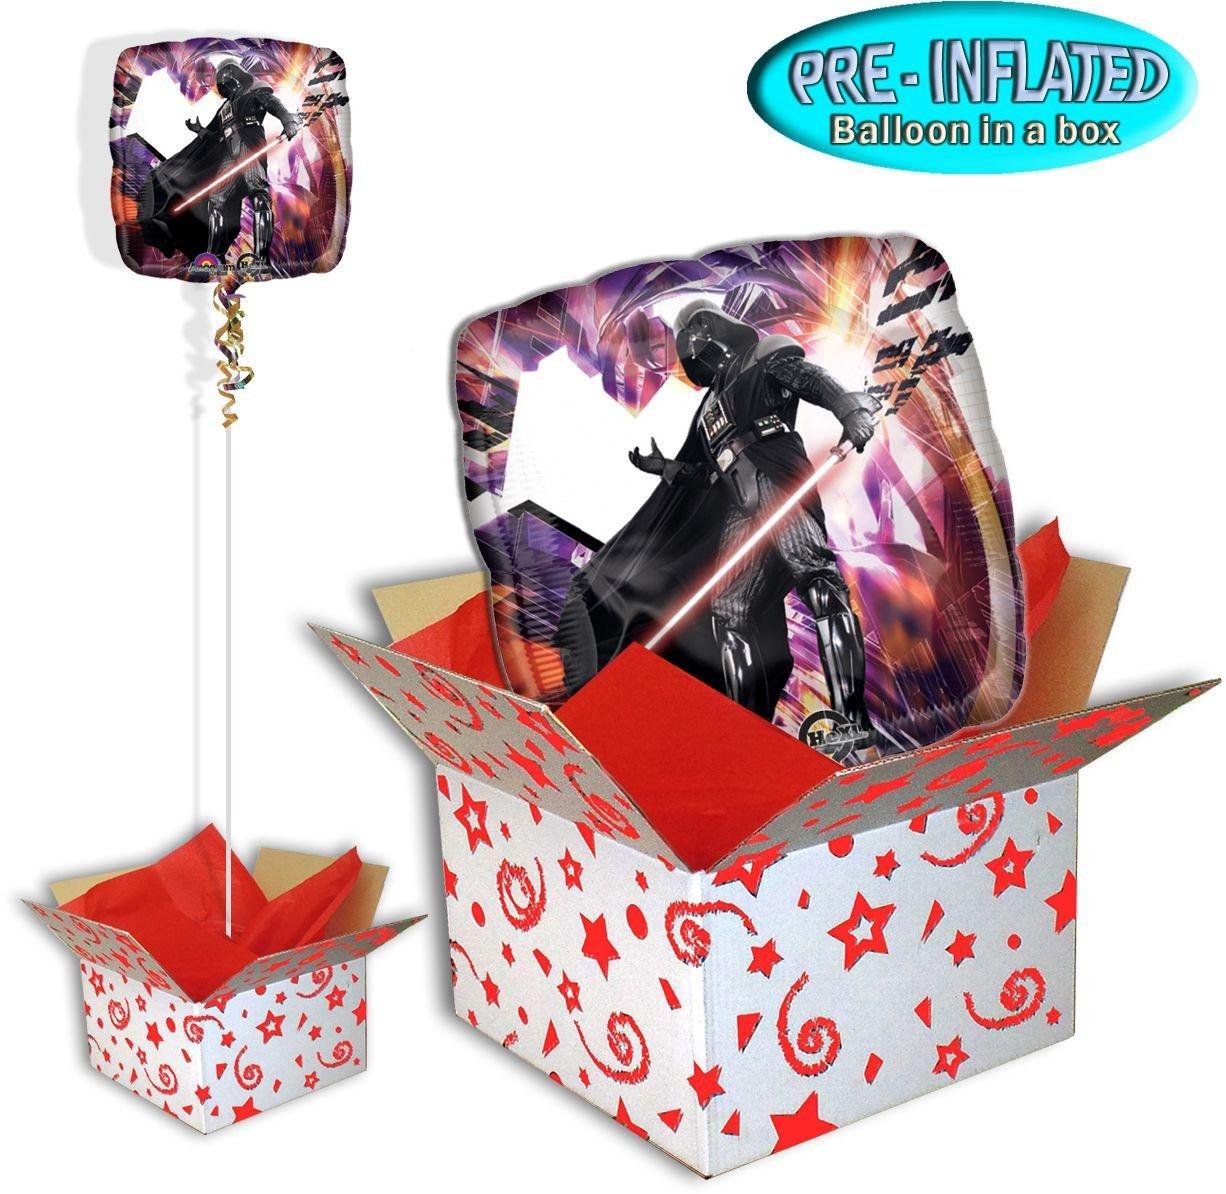 Star Wars Darth Vader Foil Balloon in a Box.